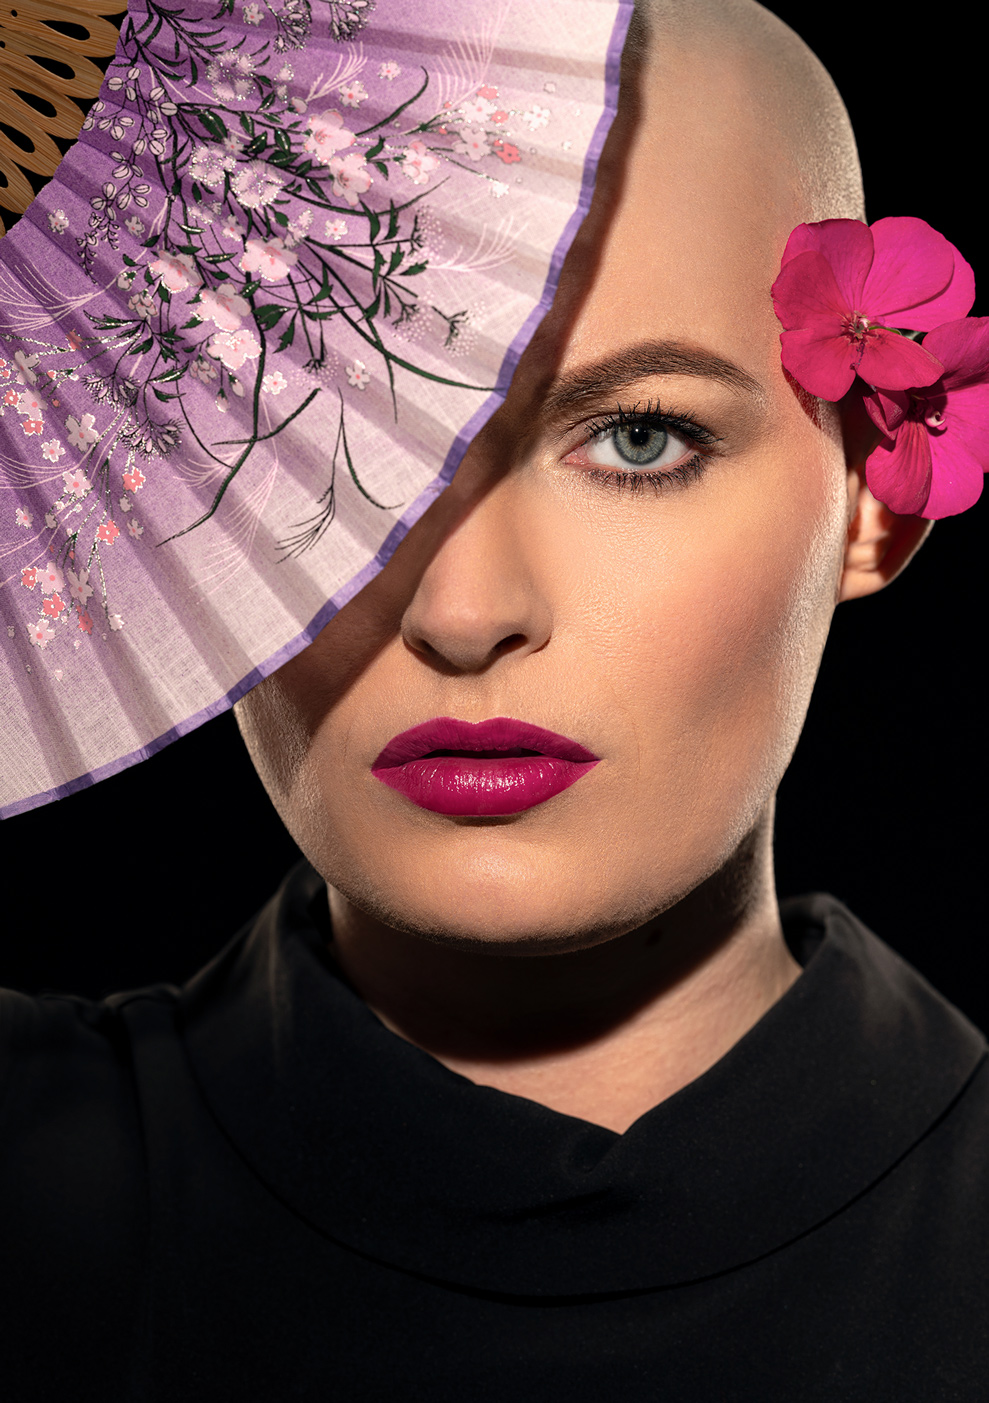 headshot of a bald model actress